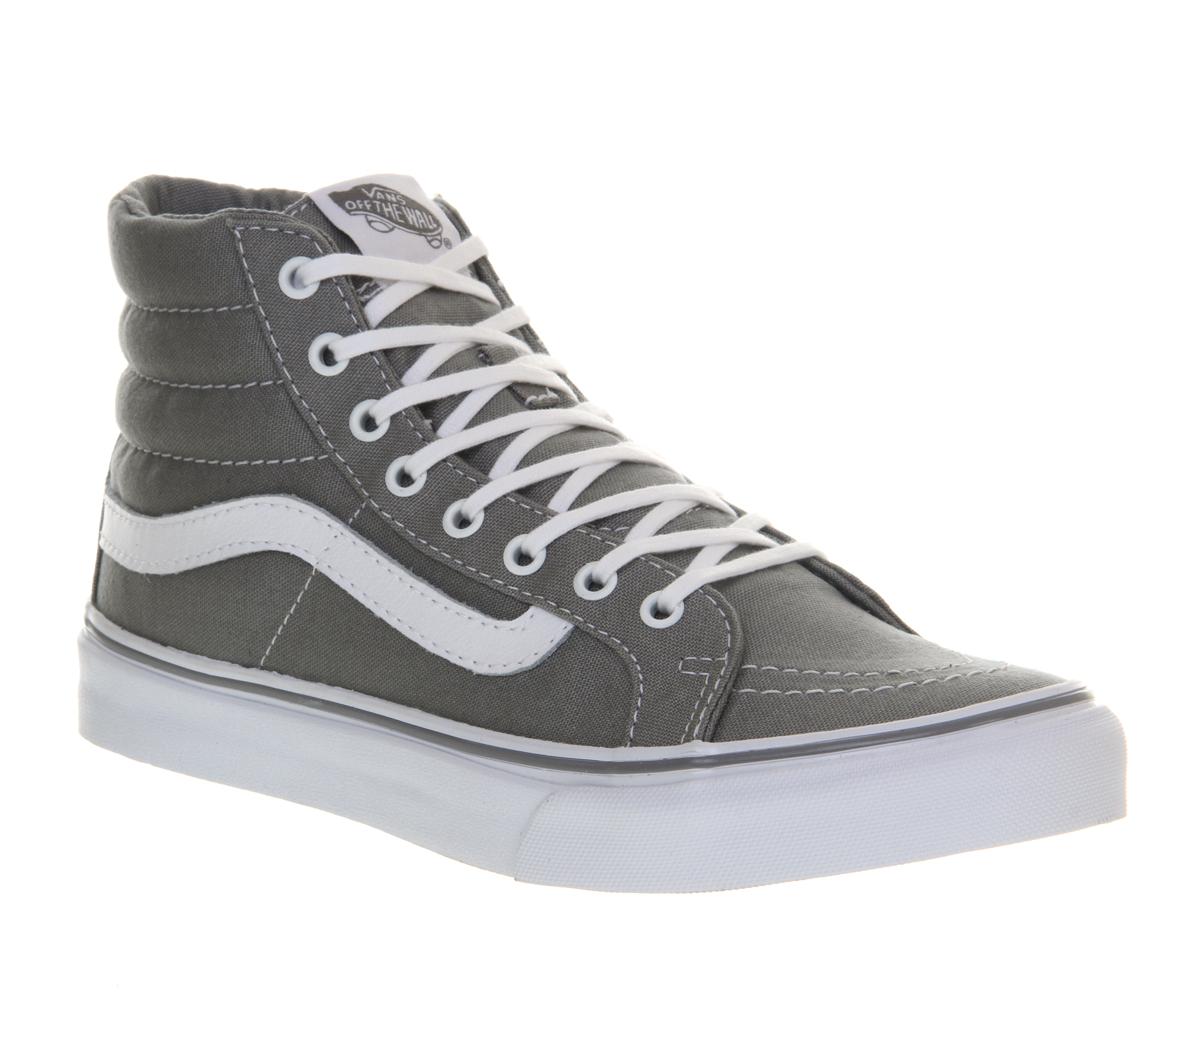 Nike Roshe Run Men's Trainers Shoe Blue White Shoes